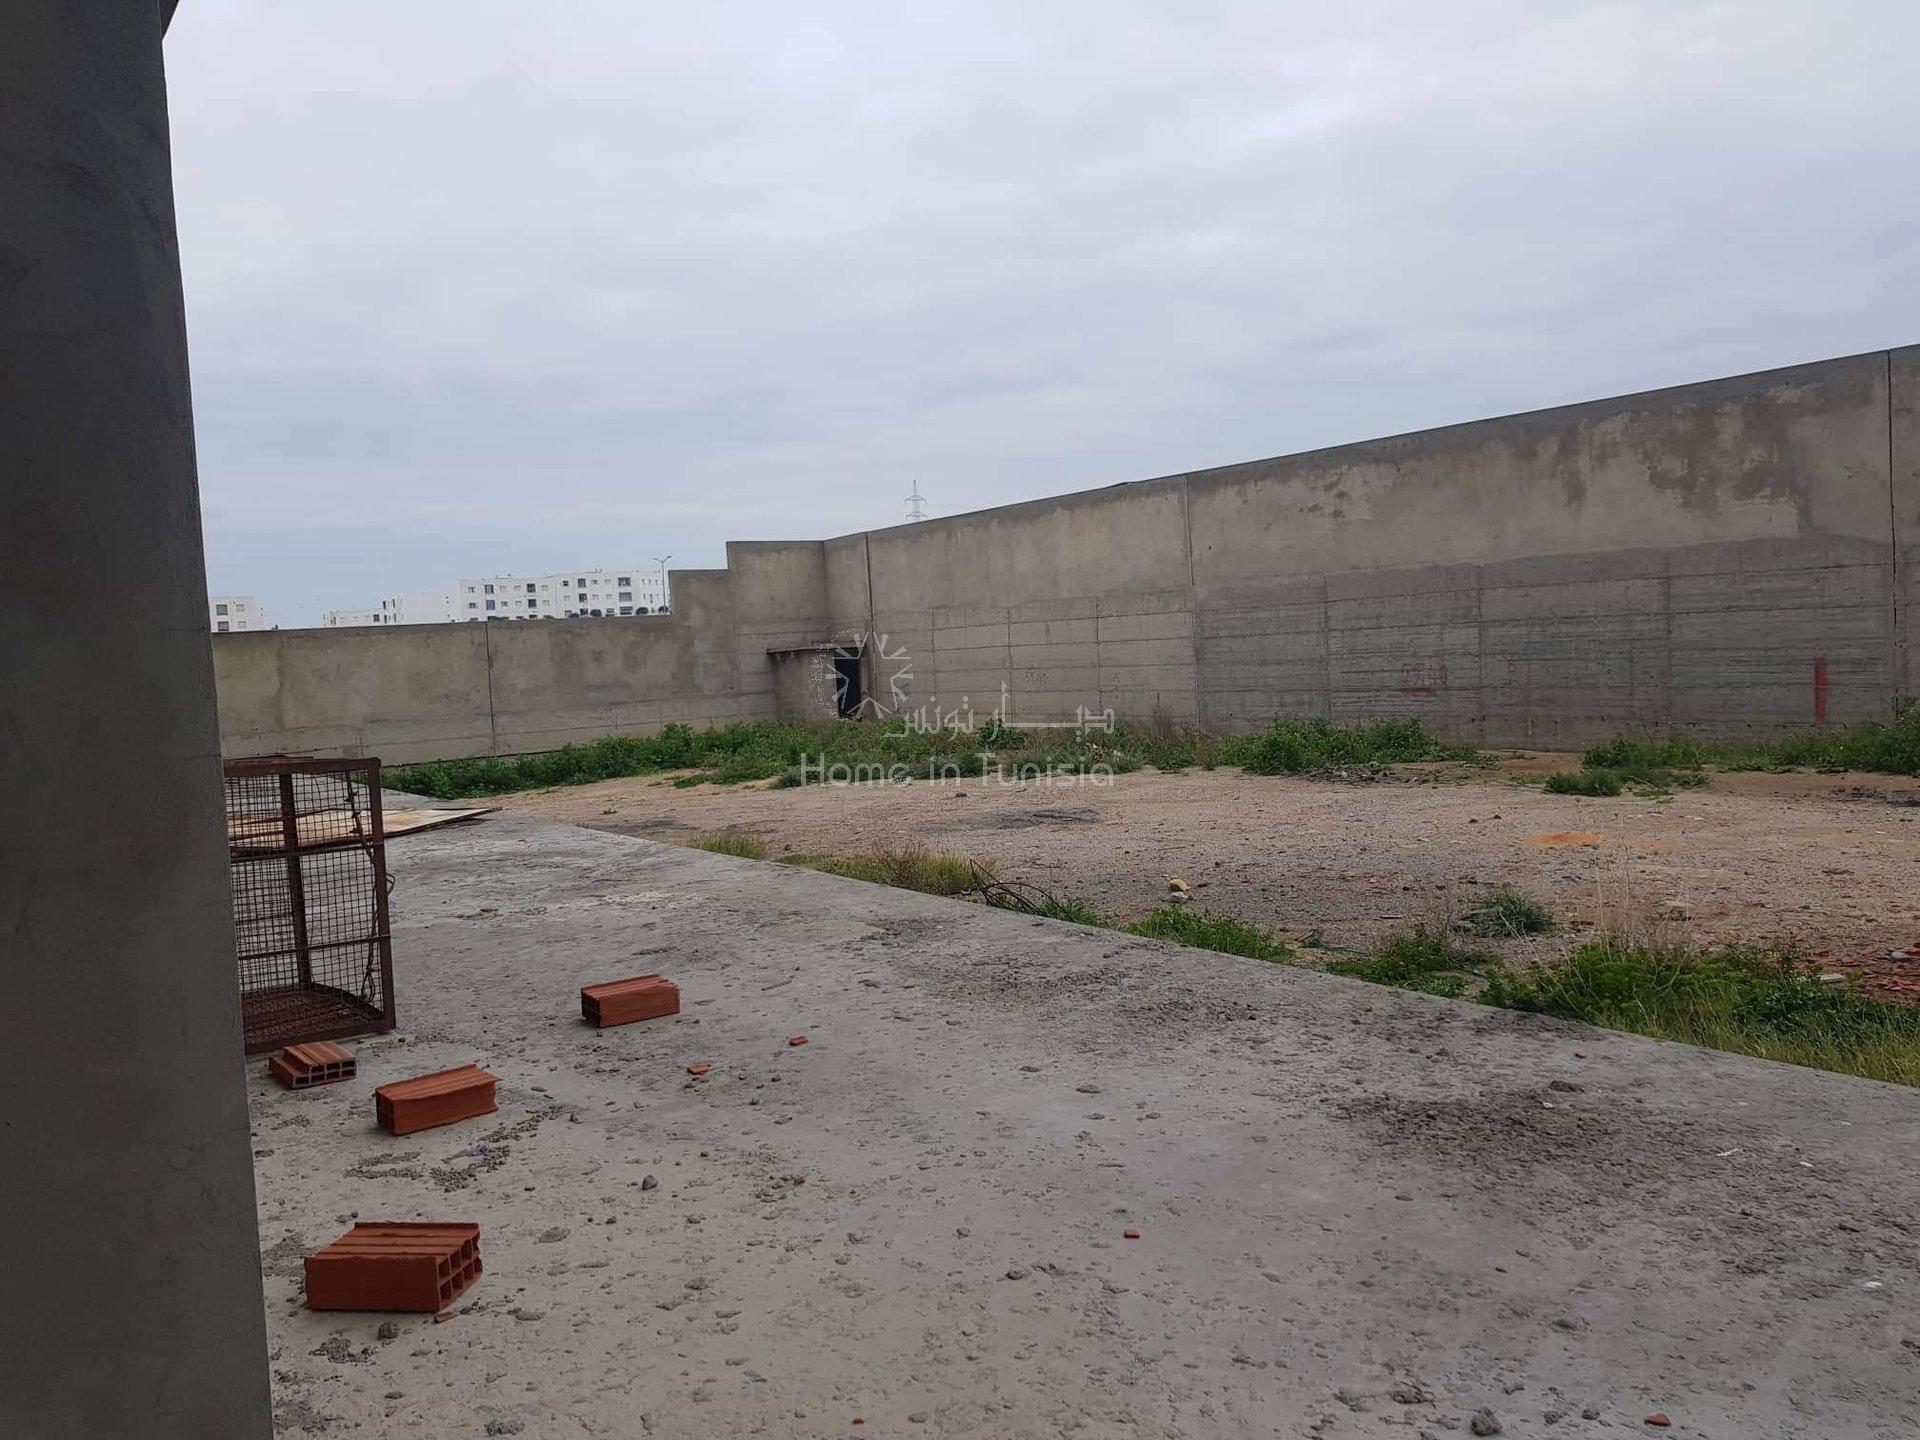 Usine a louer 6000 mètres / zone industrielle el agba